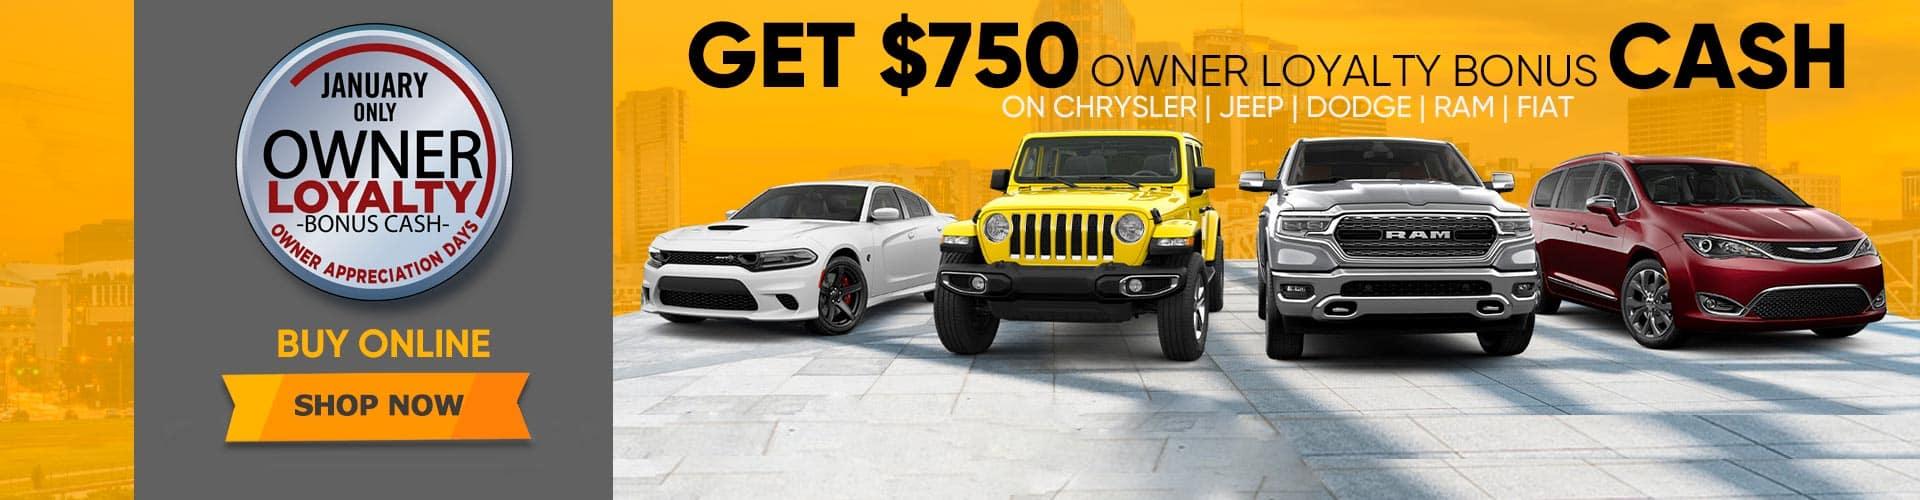 Chrysler Jeep Dodge Ram Fiat Owner Loyalty Bonus Cash